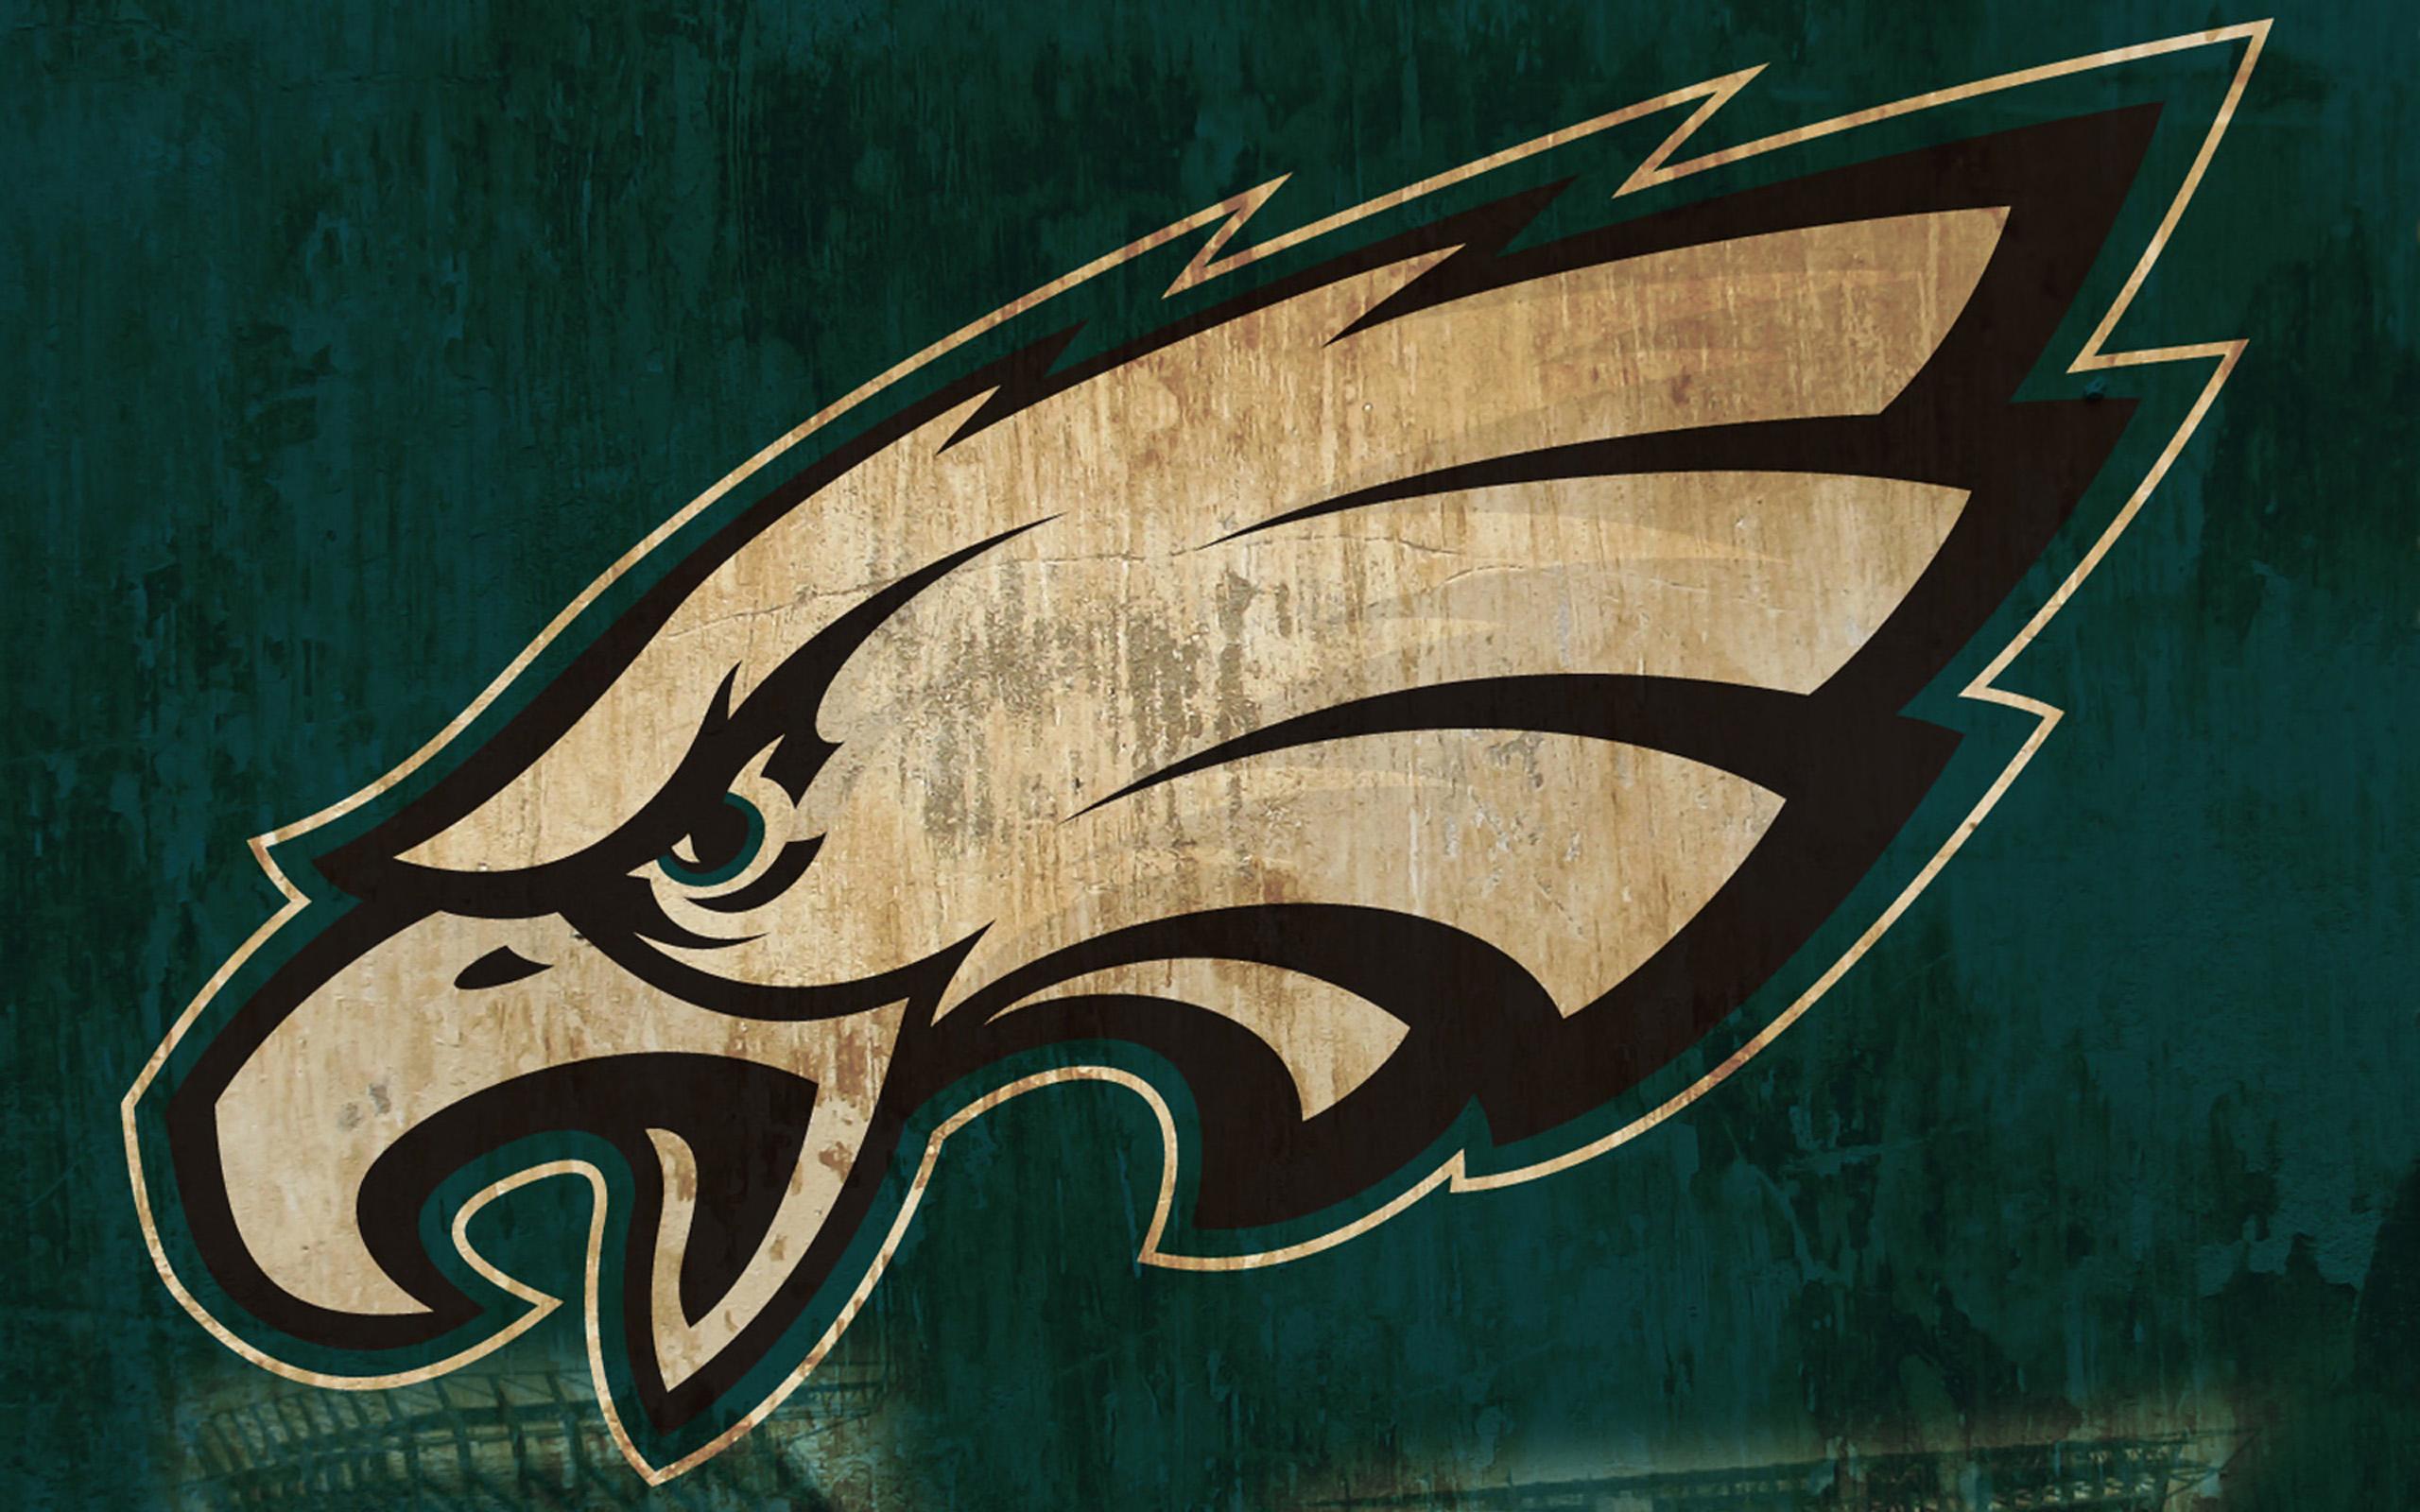 Eagles football team wallpaper - photo#21